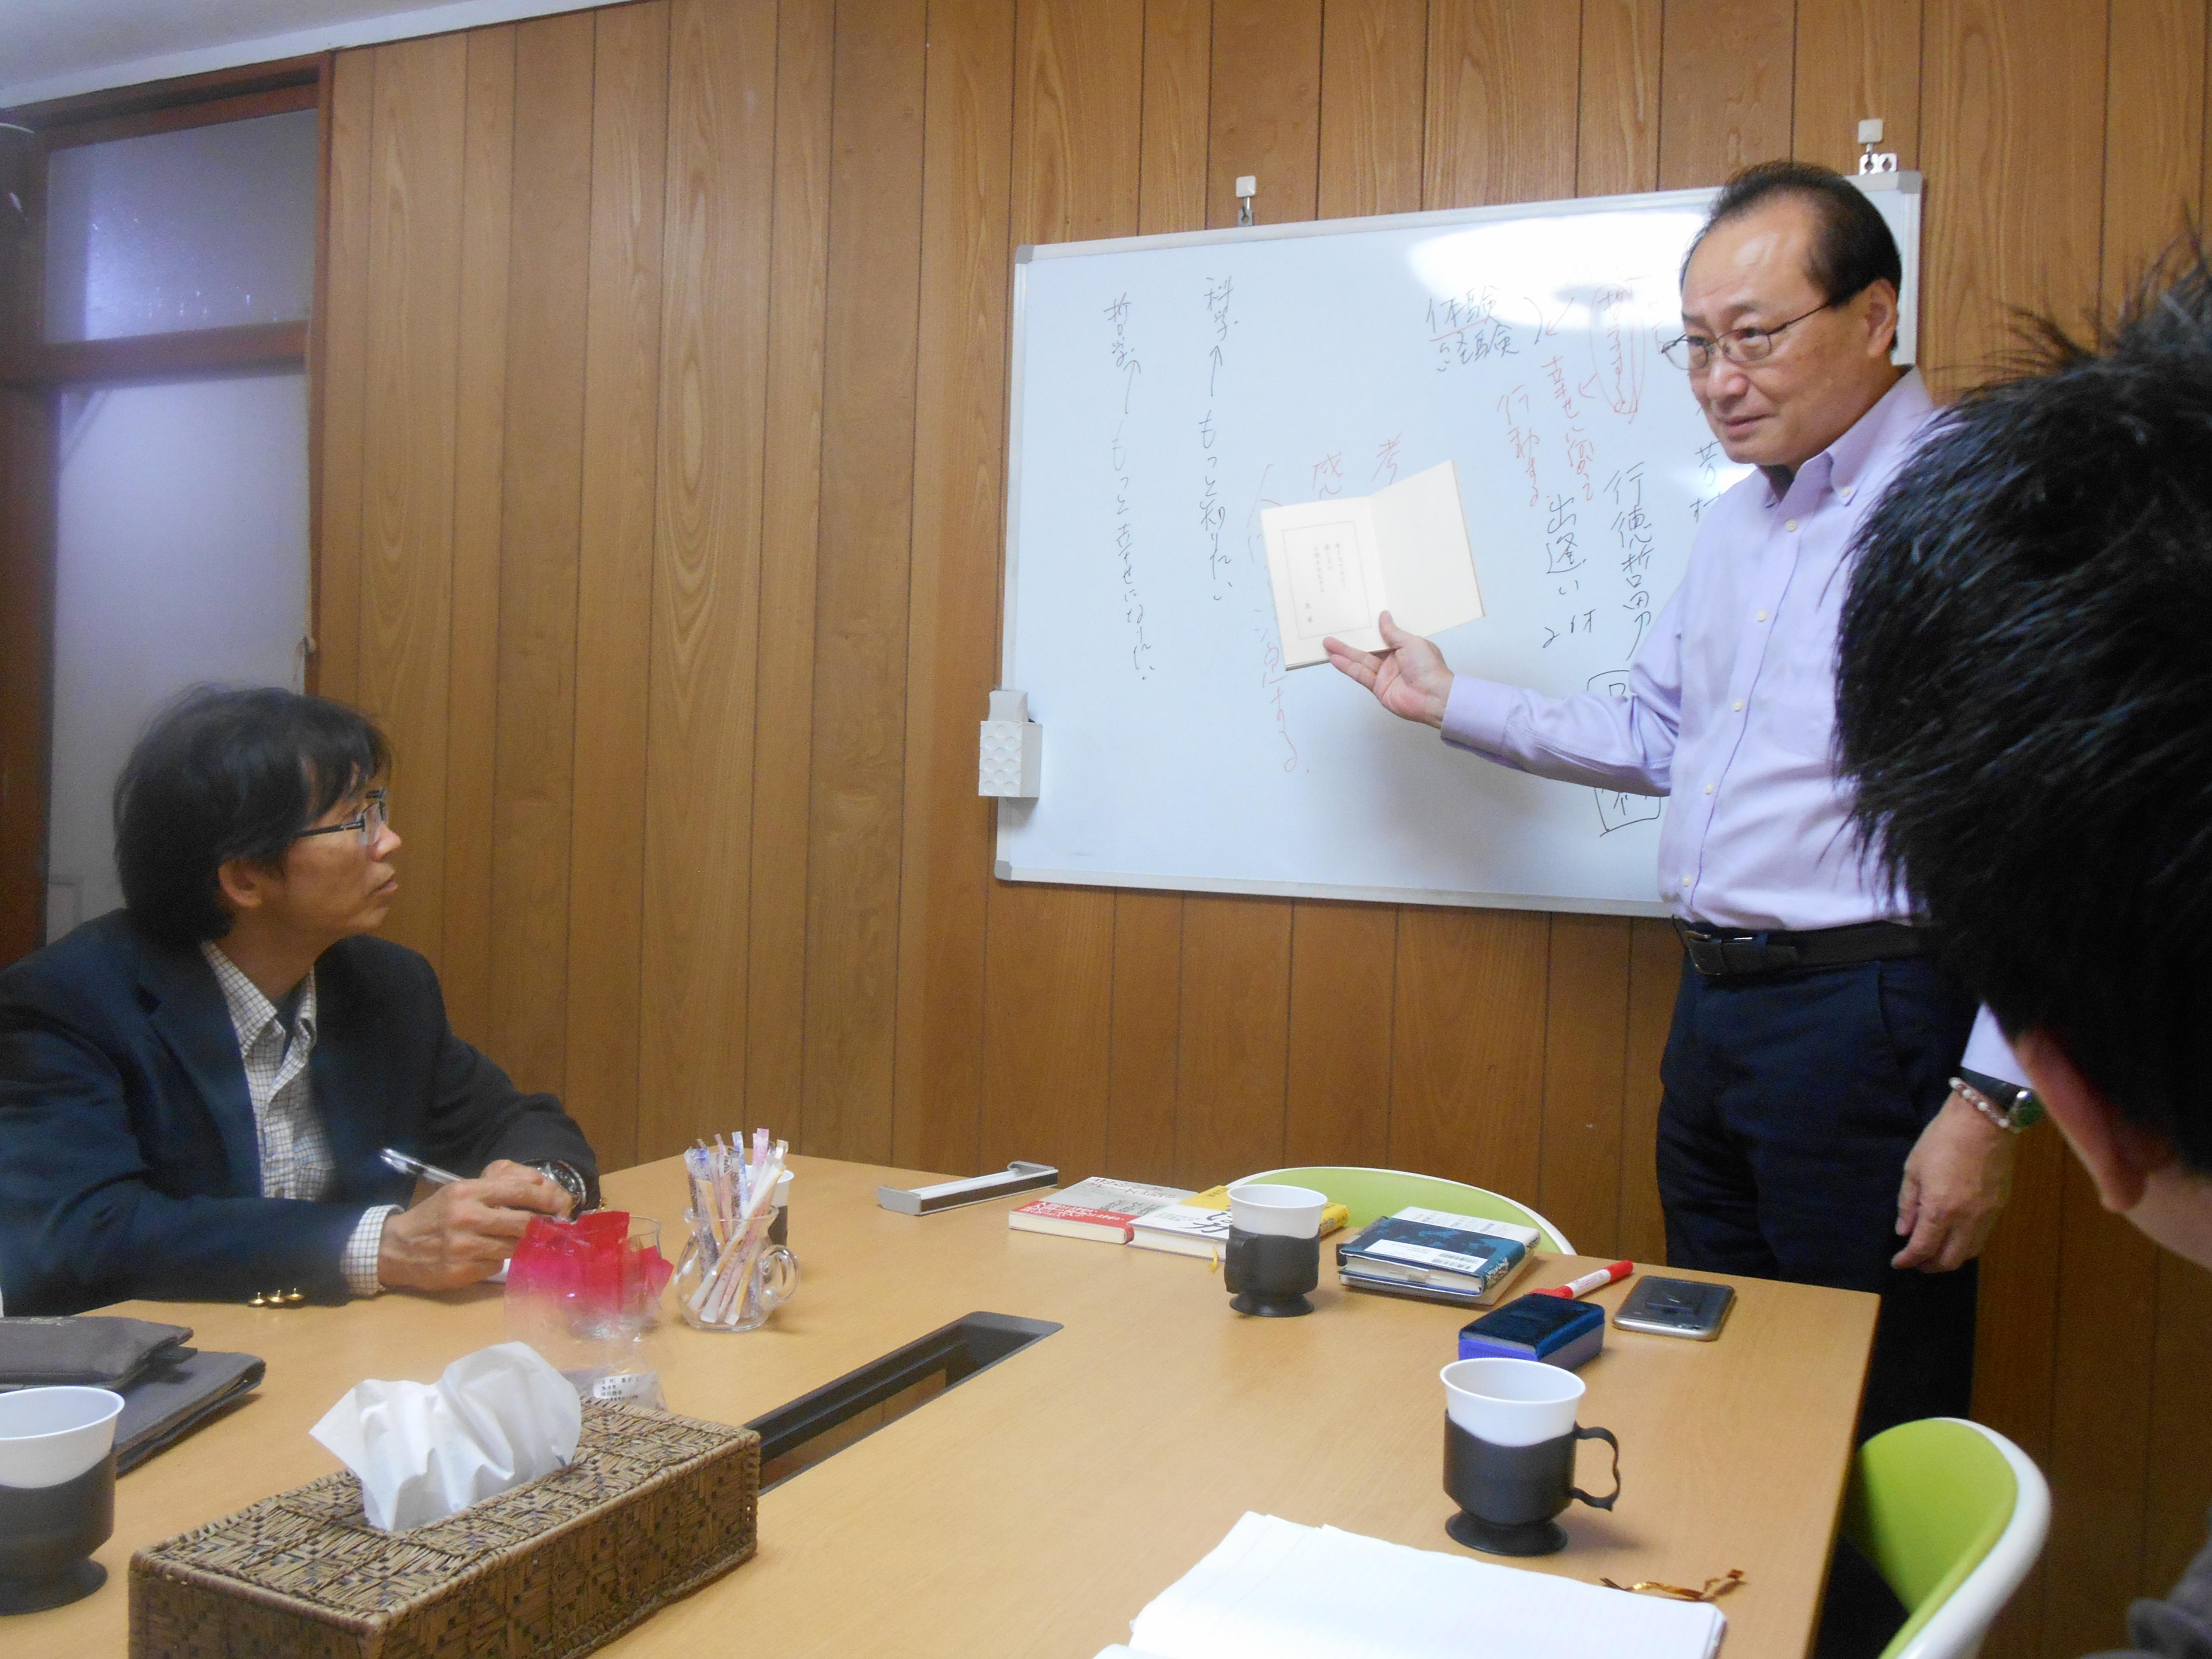 DSCN5855 - 平成30年度 東京思風塾 4月7日(土)「時代が問題をつくり、問題が人物をつくる」